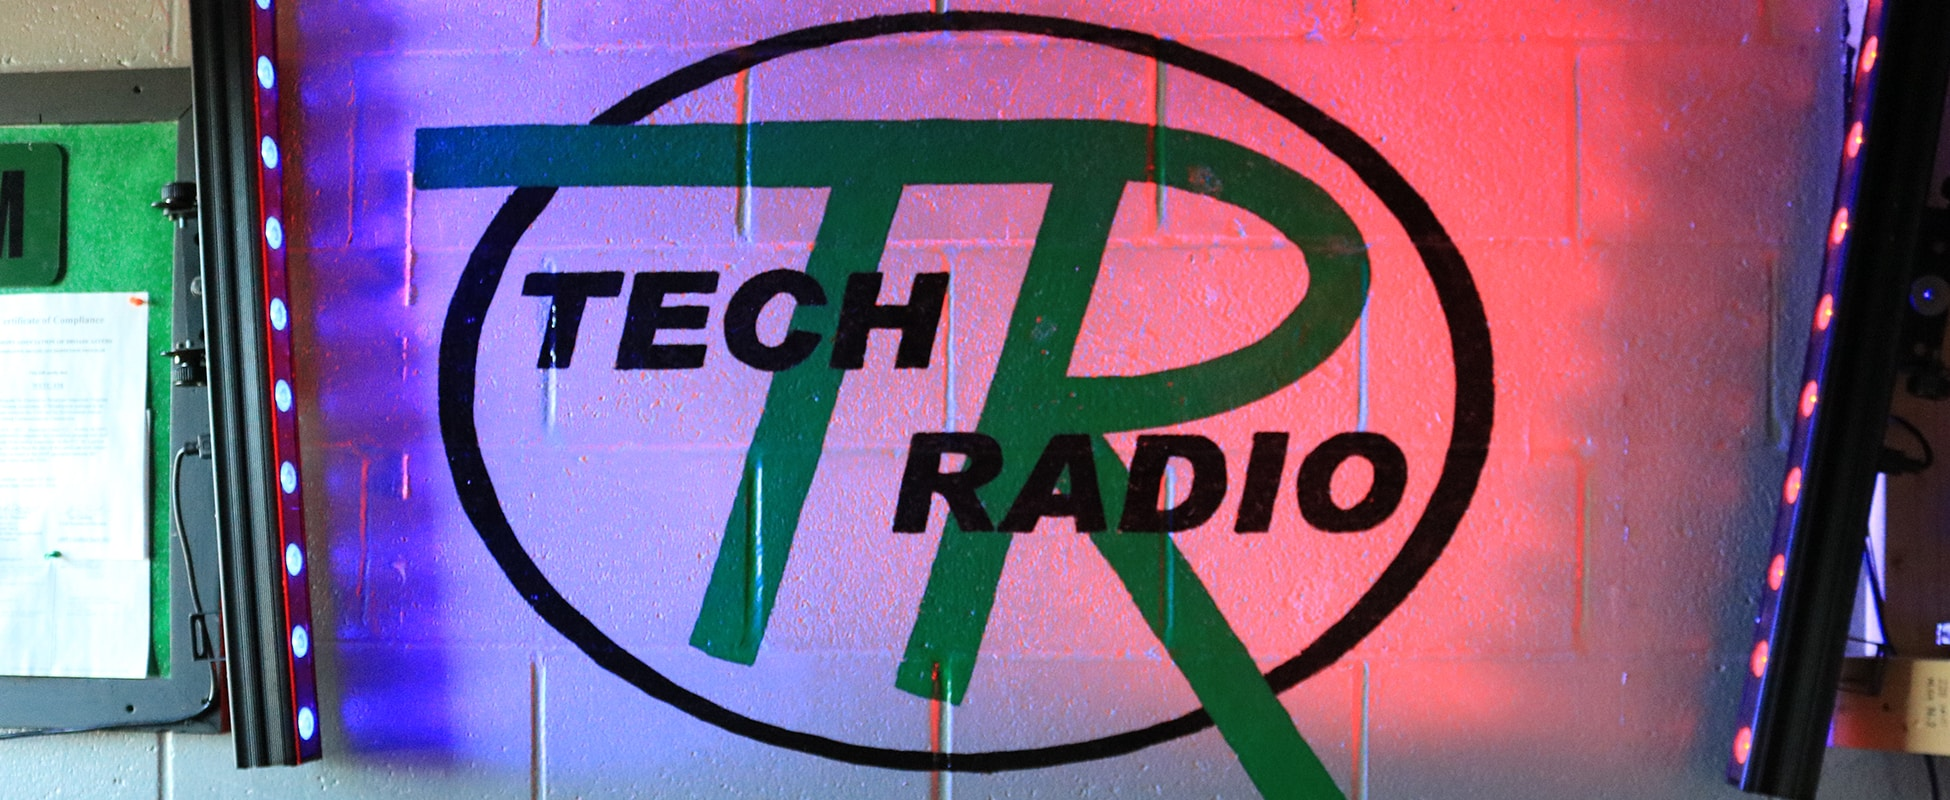 WVTC Radio station